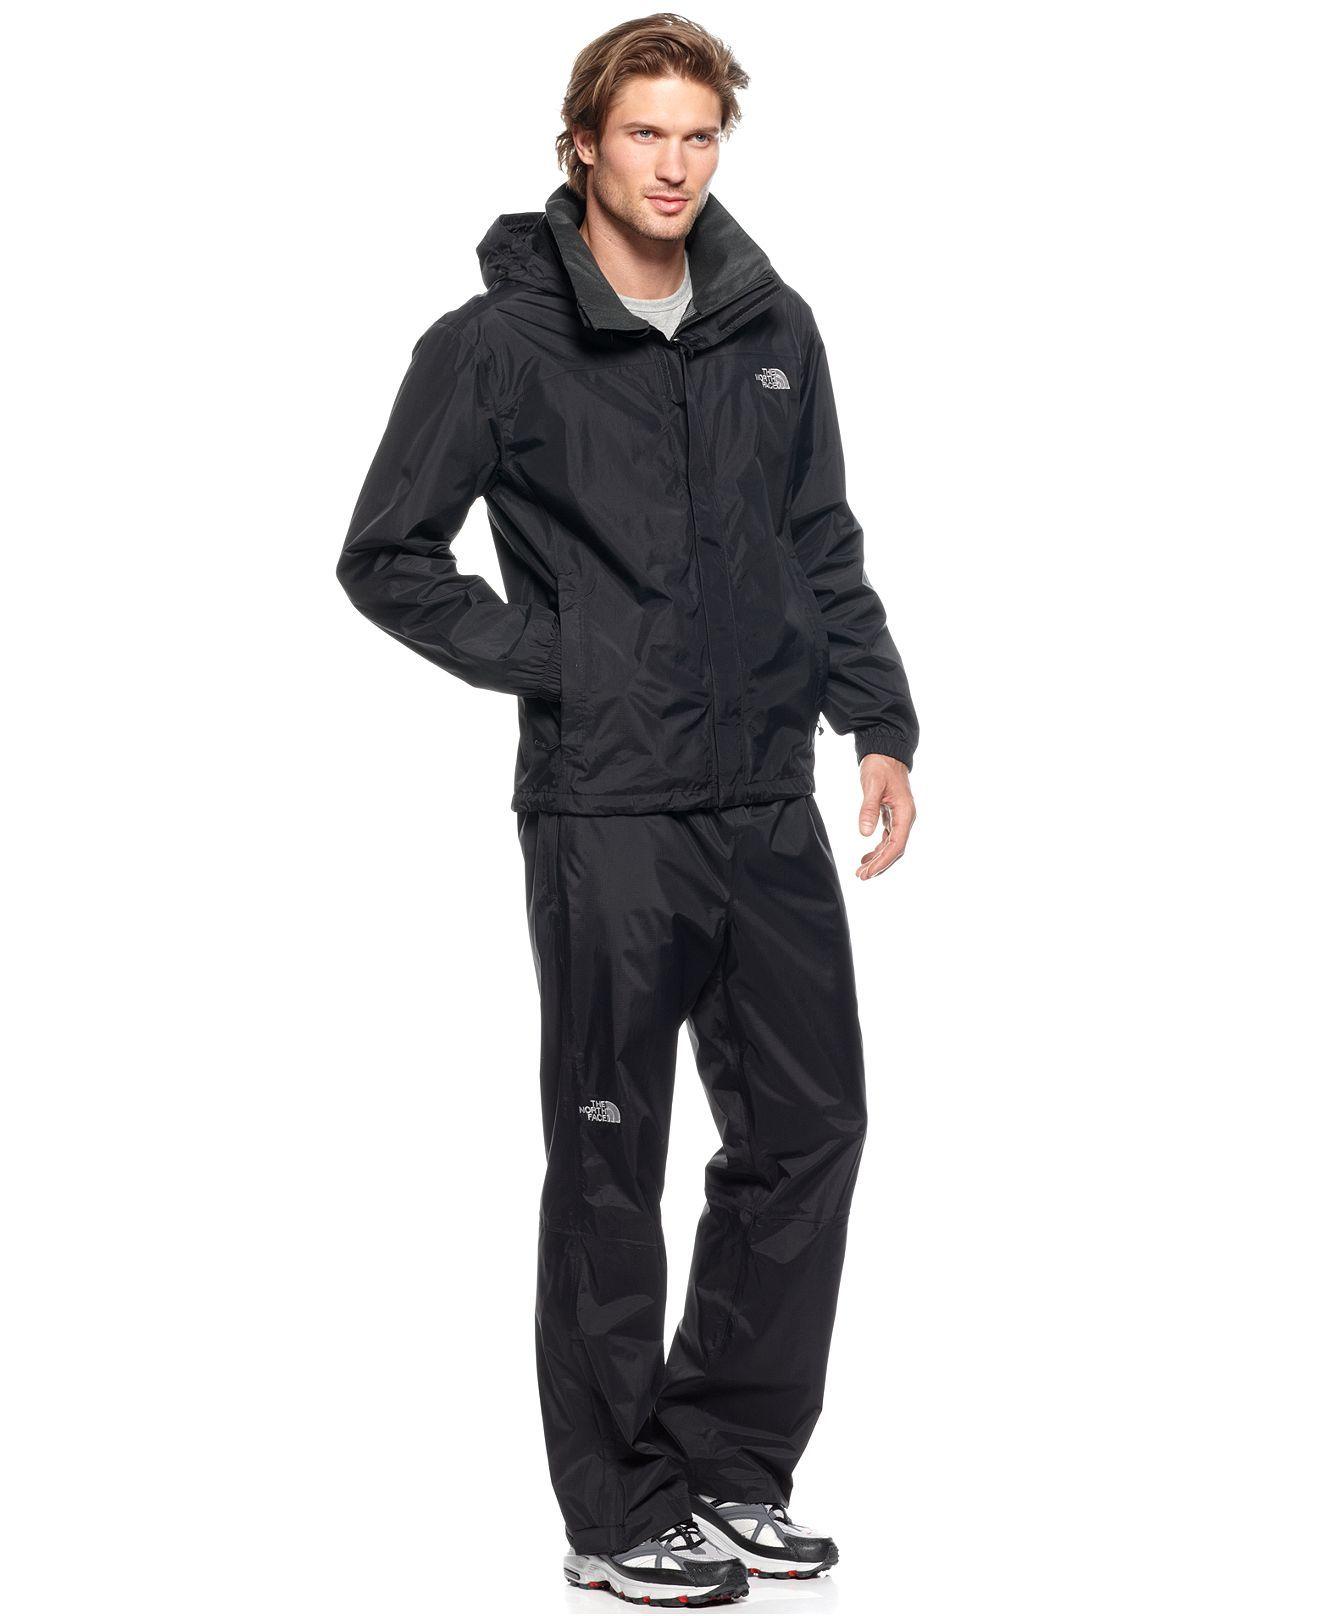 The North Face Separates Resolve Waterproof Rain Jacket And Pants Men Macy S Waterproof Rain Jacket North Face Jacket Jackets [ 1616 x 1320 Pixel ]